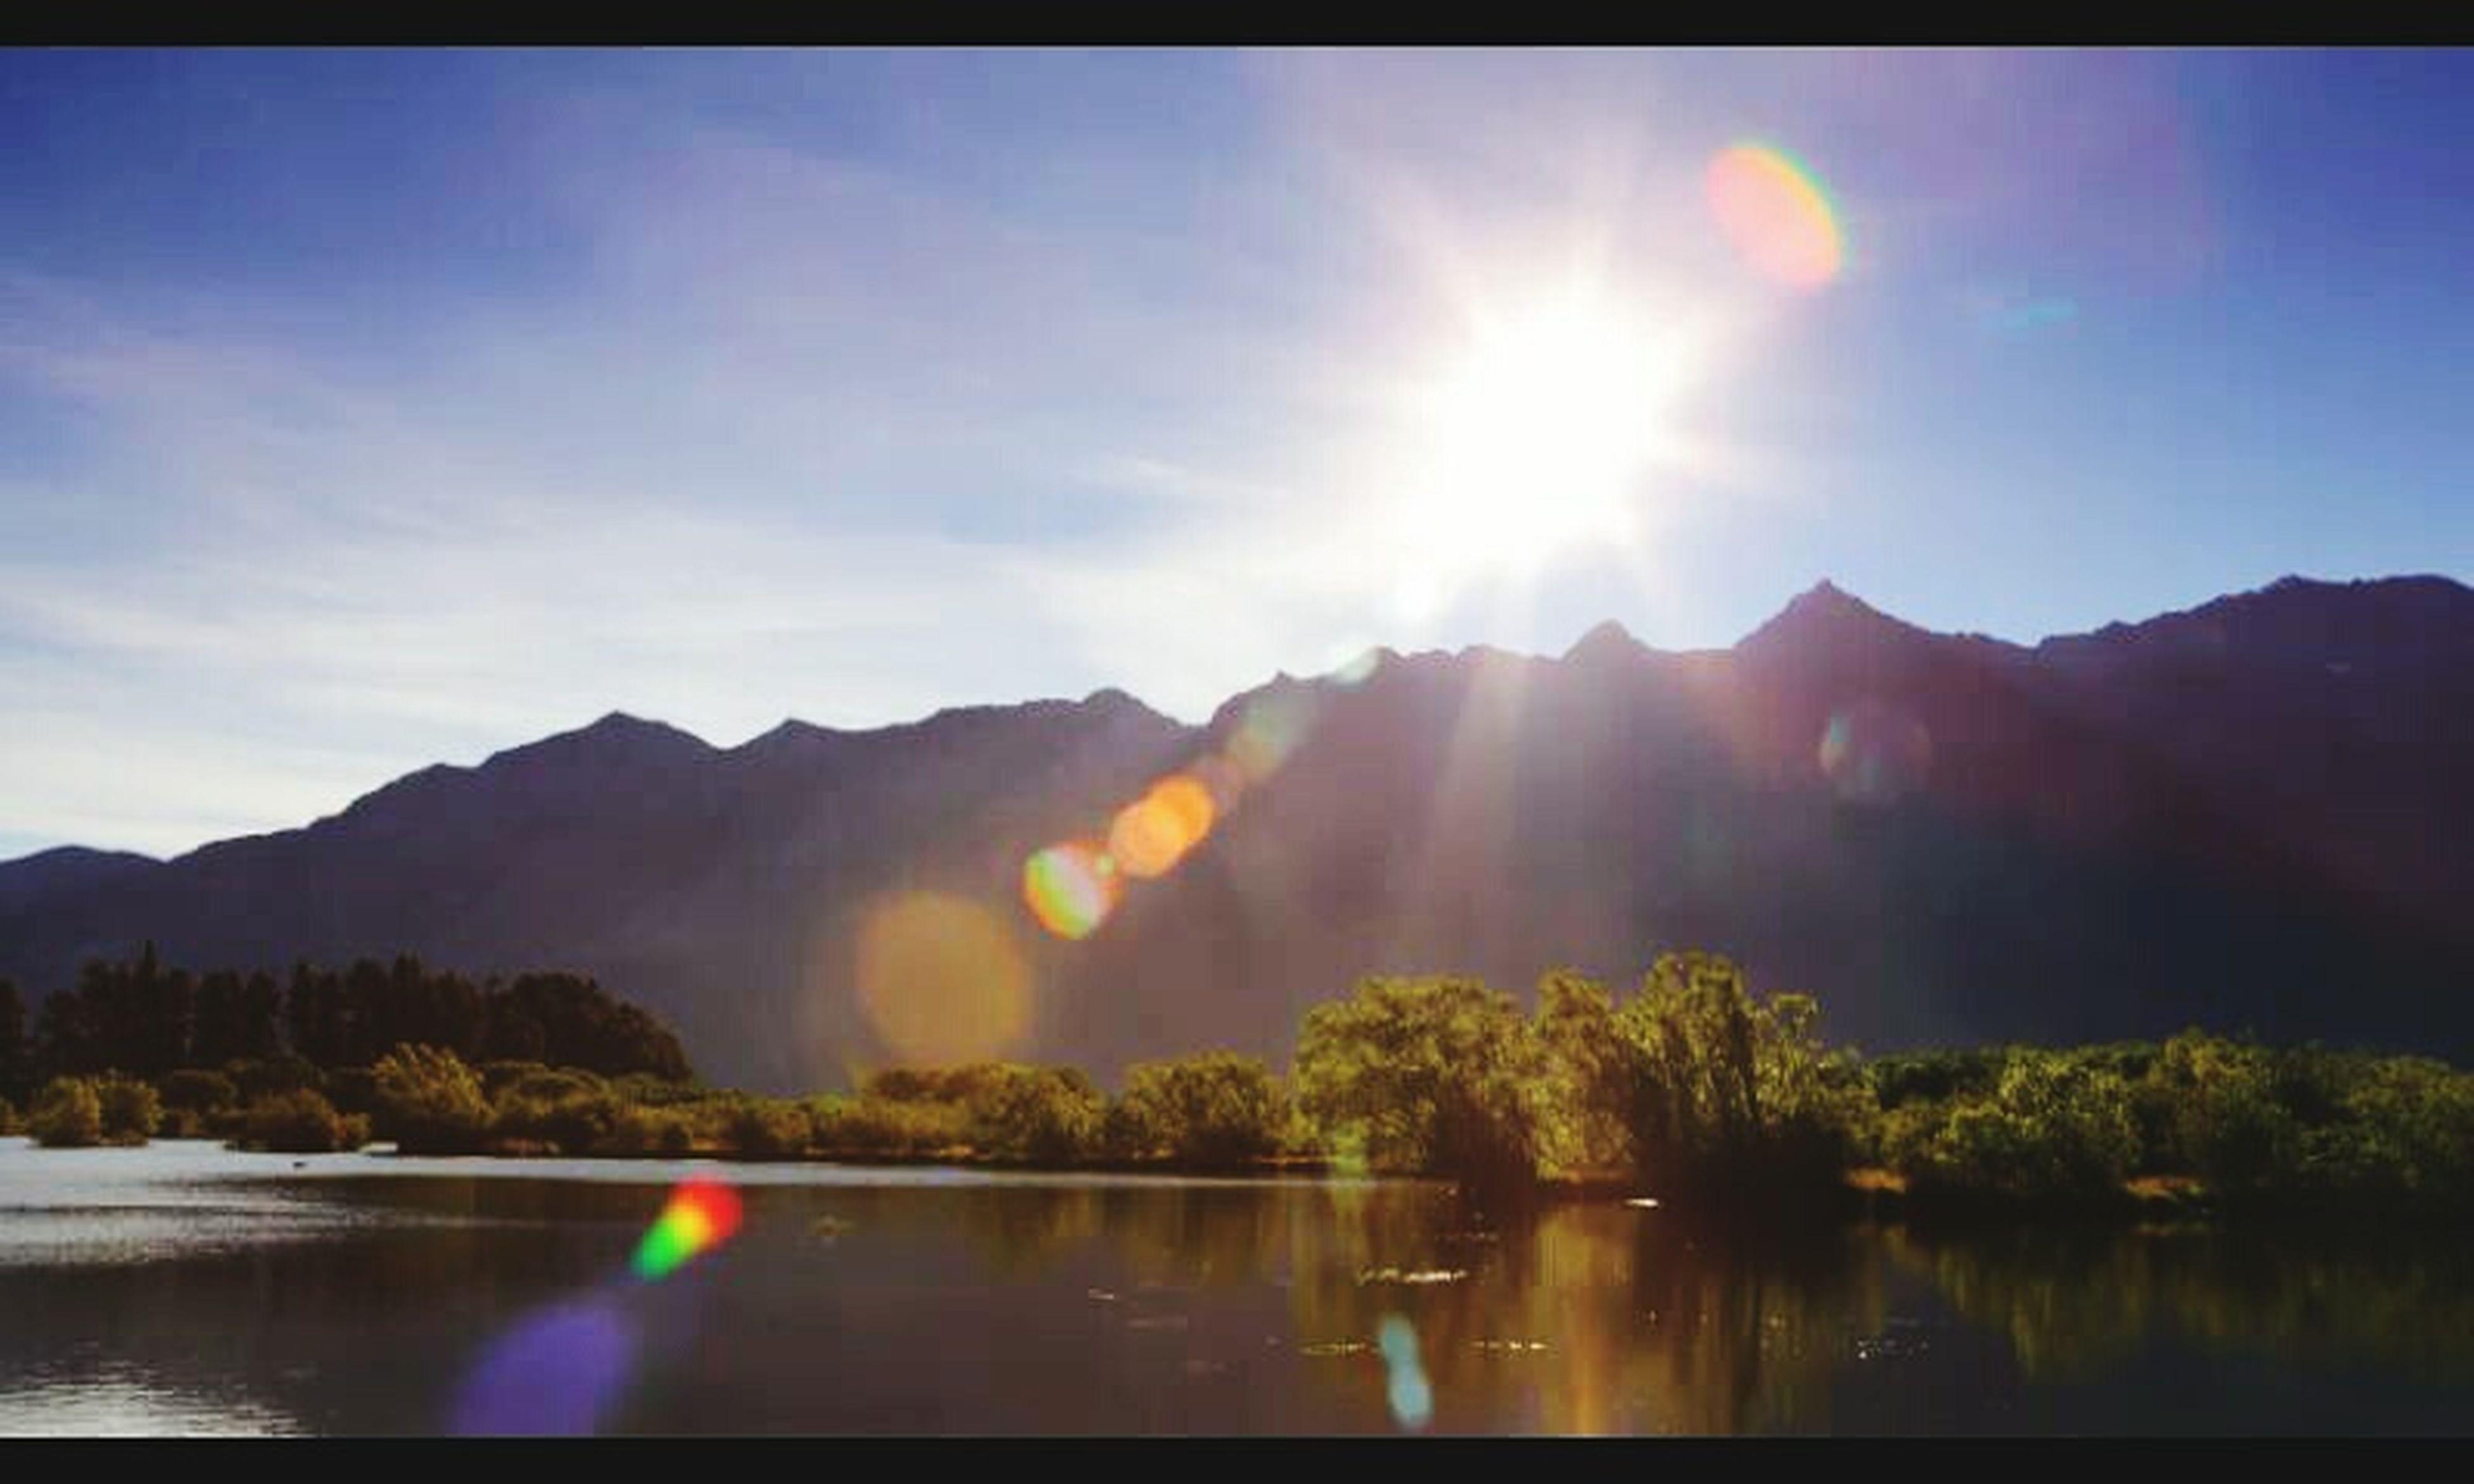 water, mountain, sun, scenics, sunbeam, tranquil scene, beauty in nature, mountain range, tranquility, lake, sky, sunlight, reflection, nature, lens flare, idyllic, river, waterfront, panoramic, cloud - sky